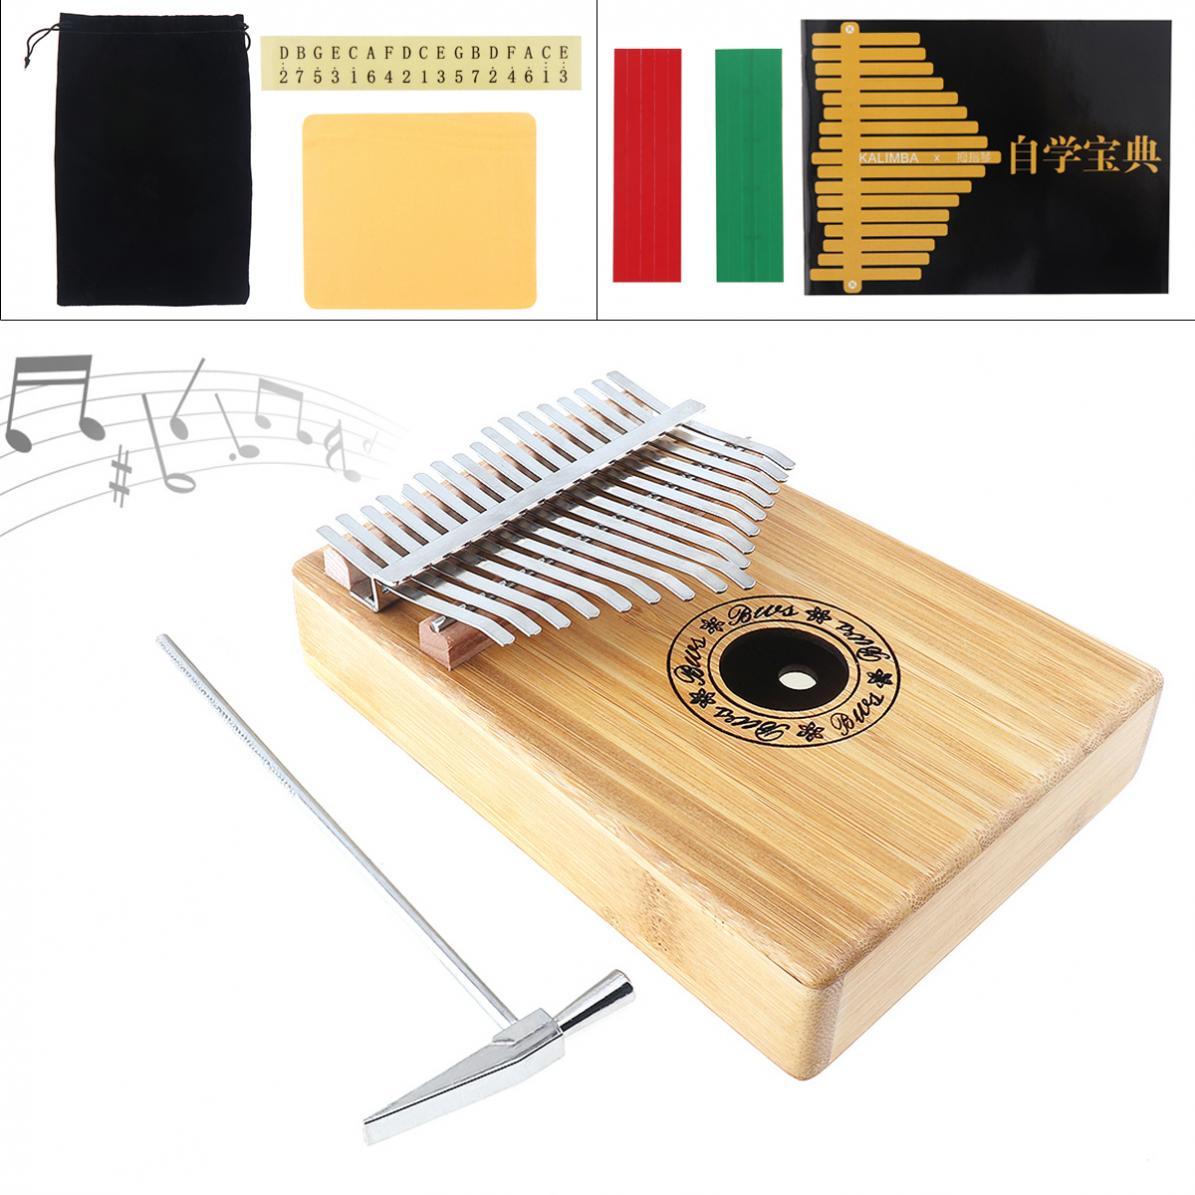 17 Key Kalimba Single Board Bamboo Thumb Piano Mbira Mini Natural Keyboard Instrument with Complete Accessories